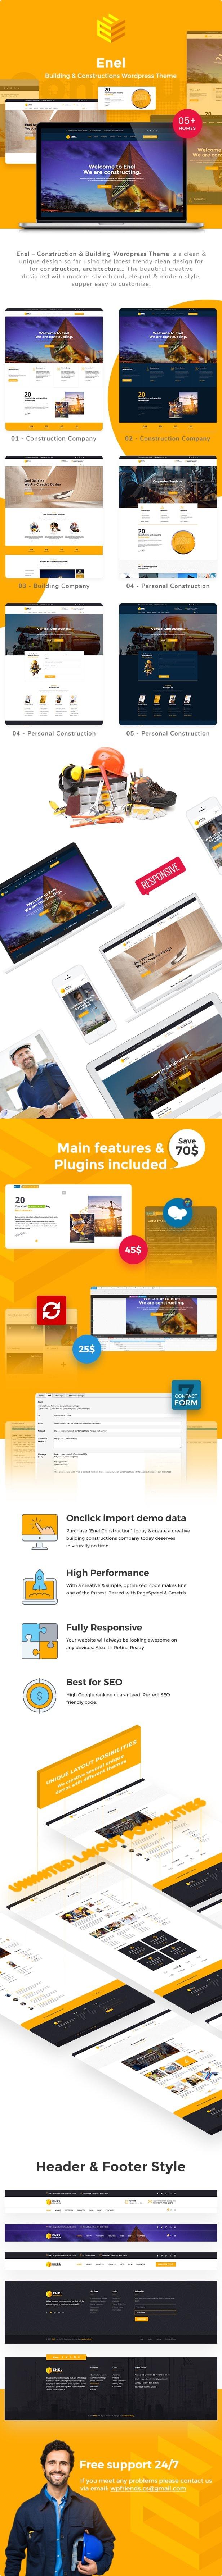 Enel - Construction & Building WordPress Theme